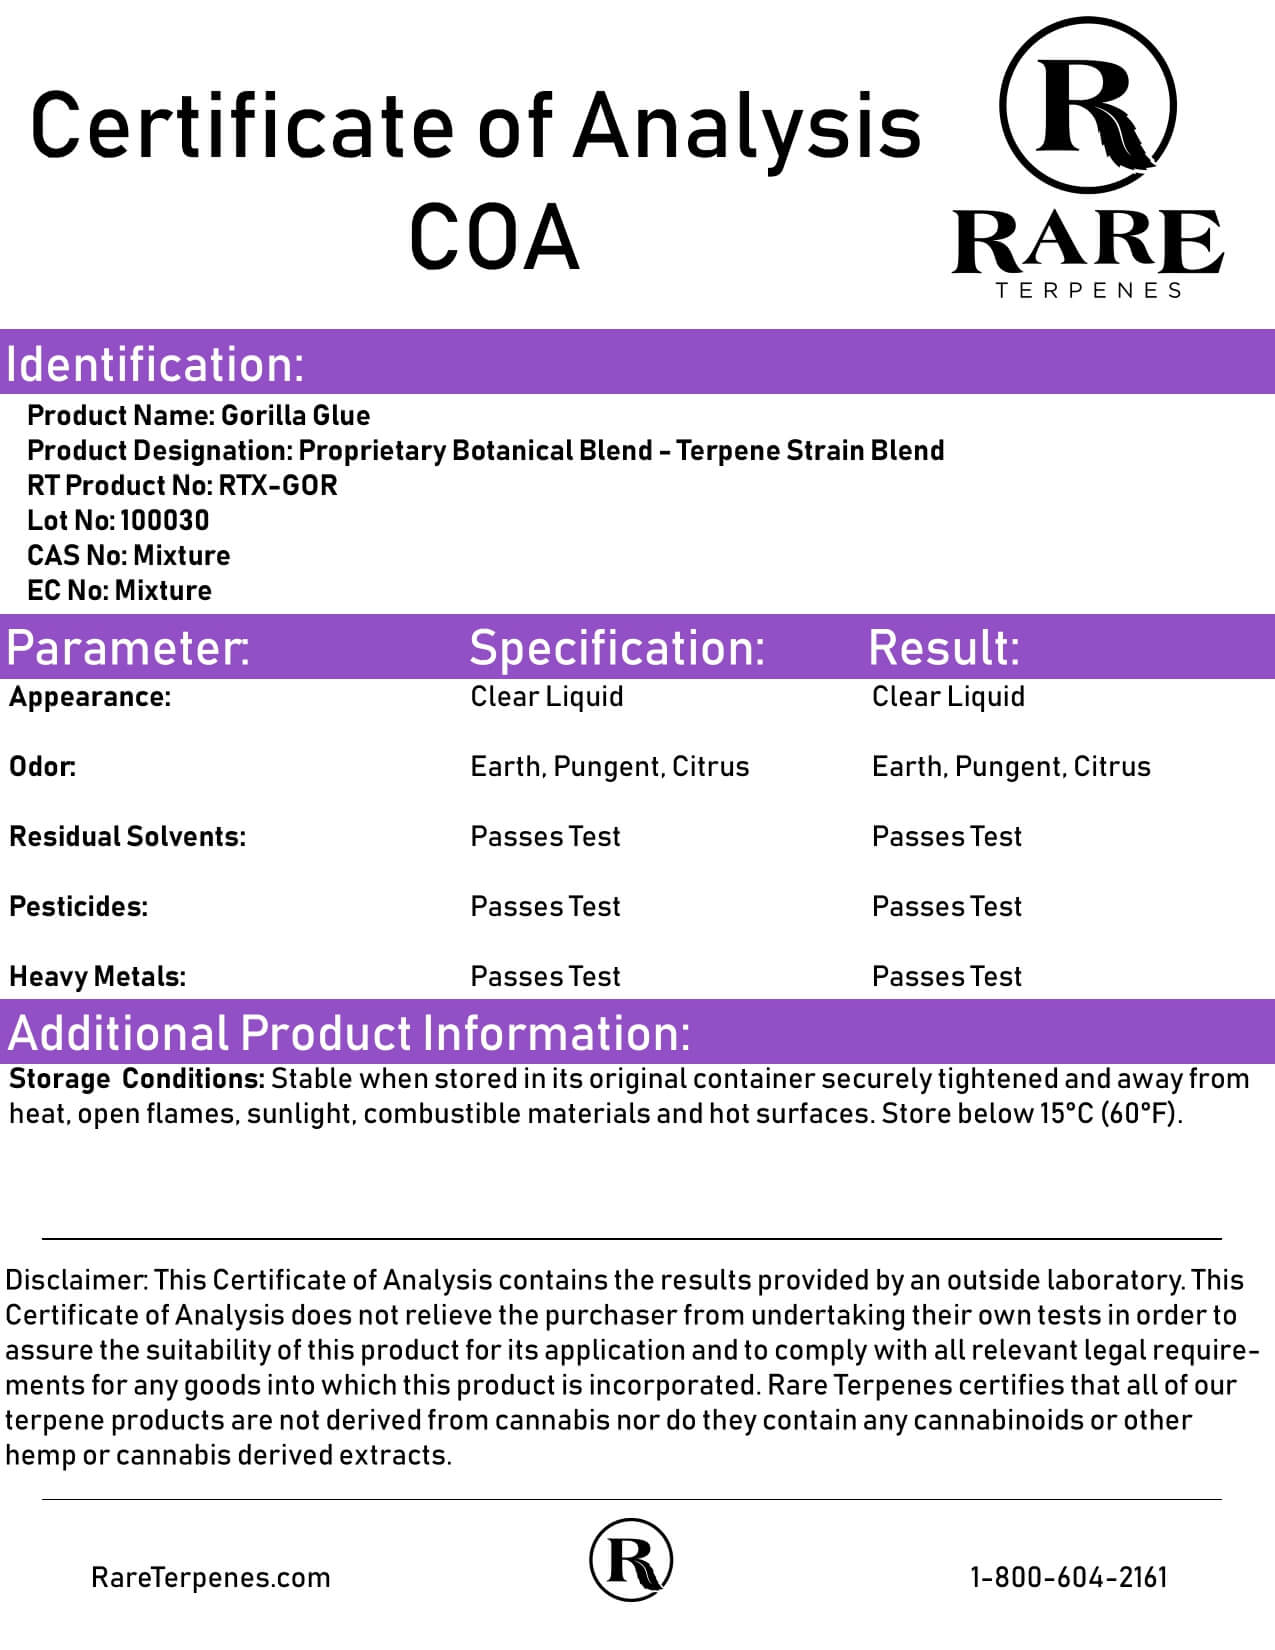 Rare Terpenes Tepene Strain Blends Gorilla Glue Lab Report